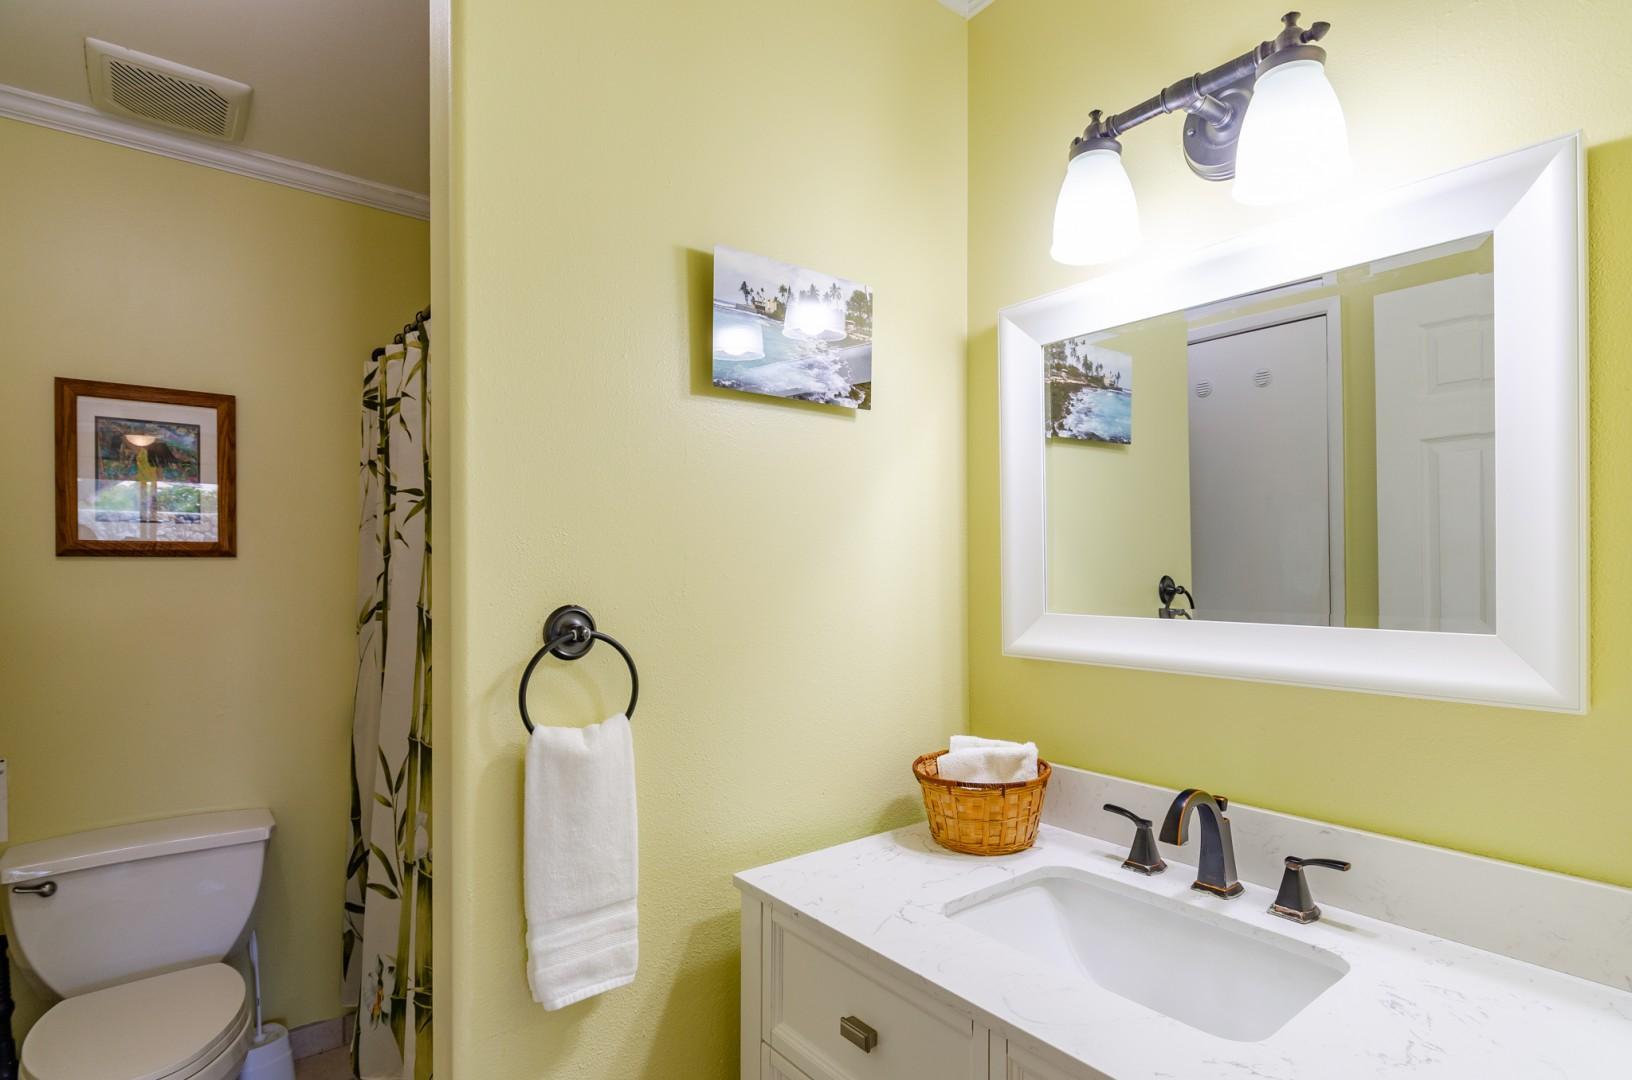 Downstairs guest bathroom